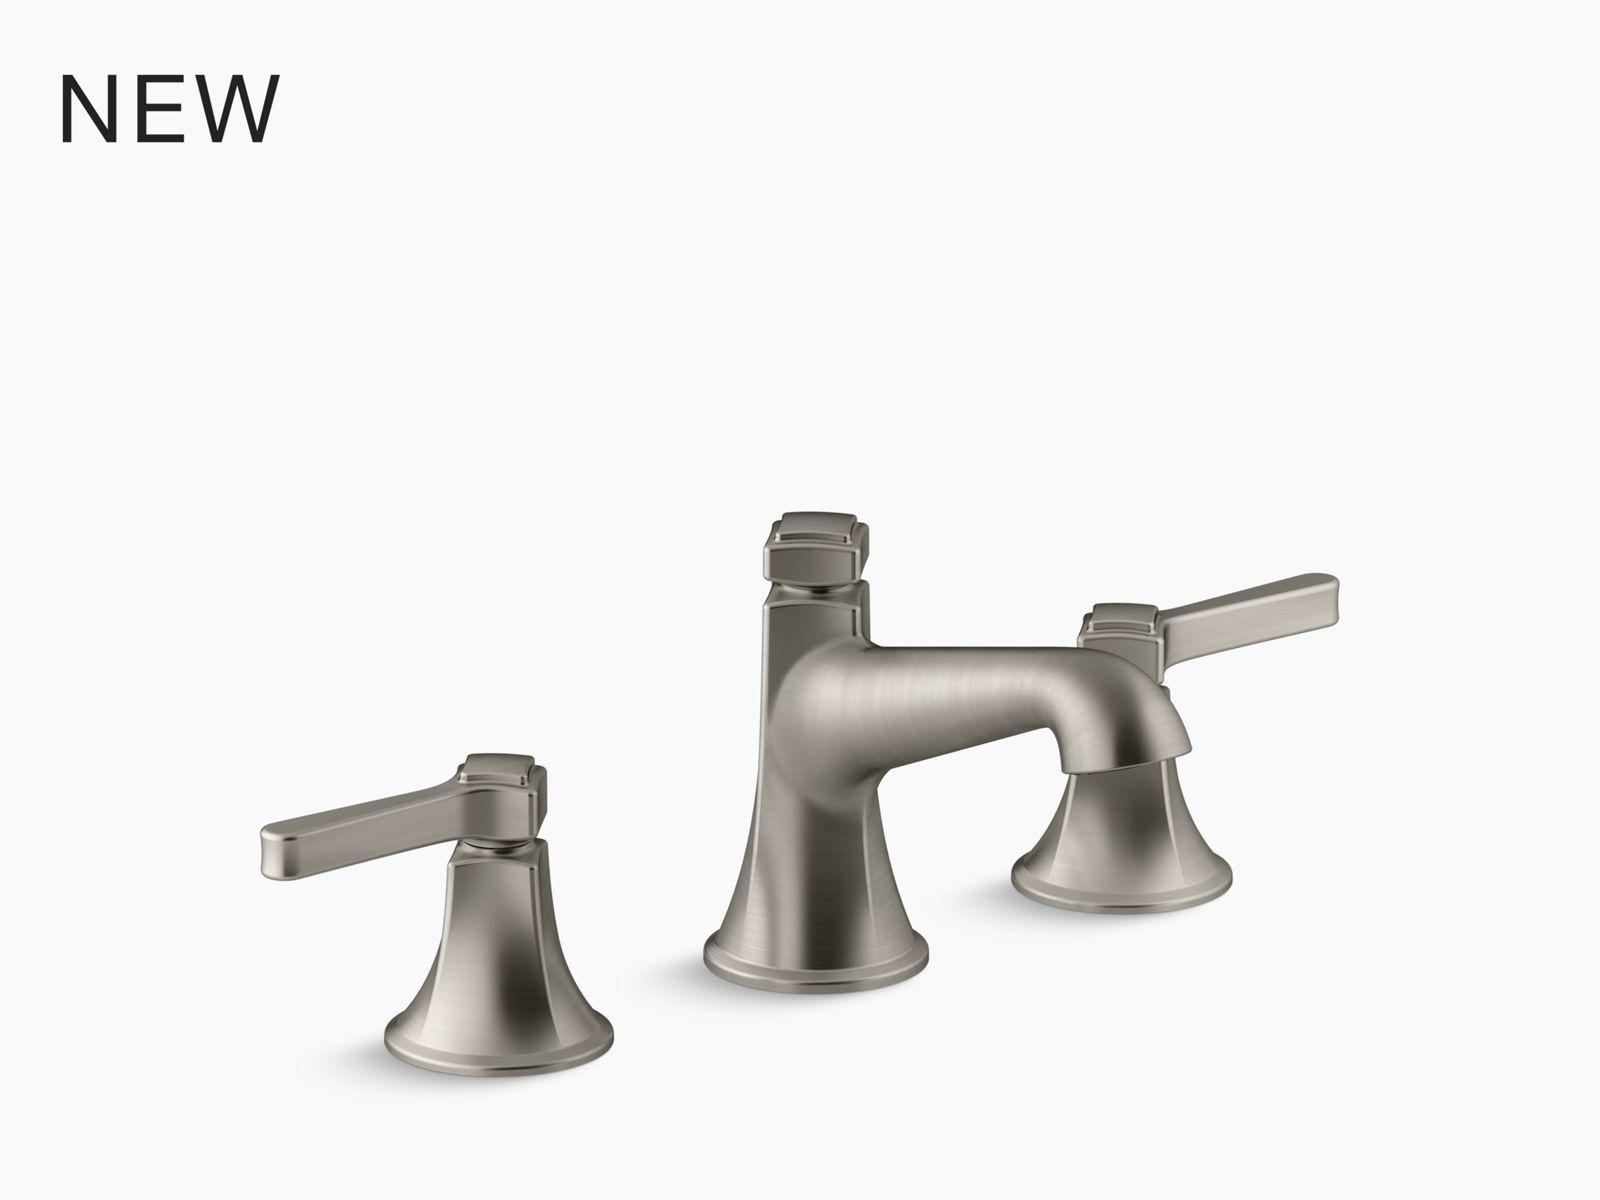 artifacts single hole kitchen sink faucet with 13 1 2 swing spout victorian spout design